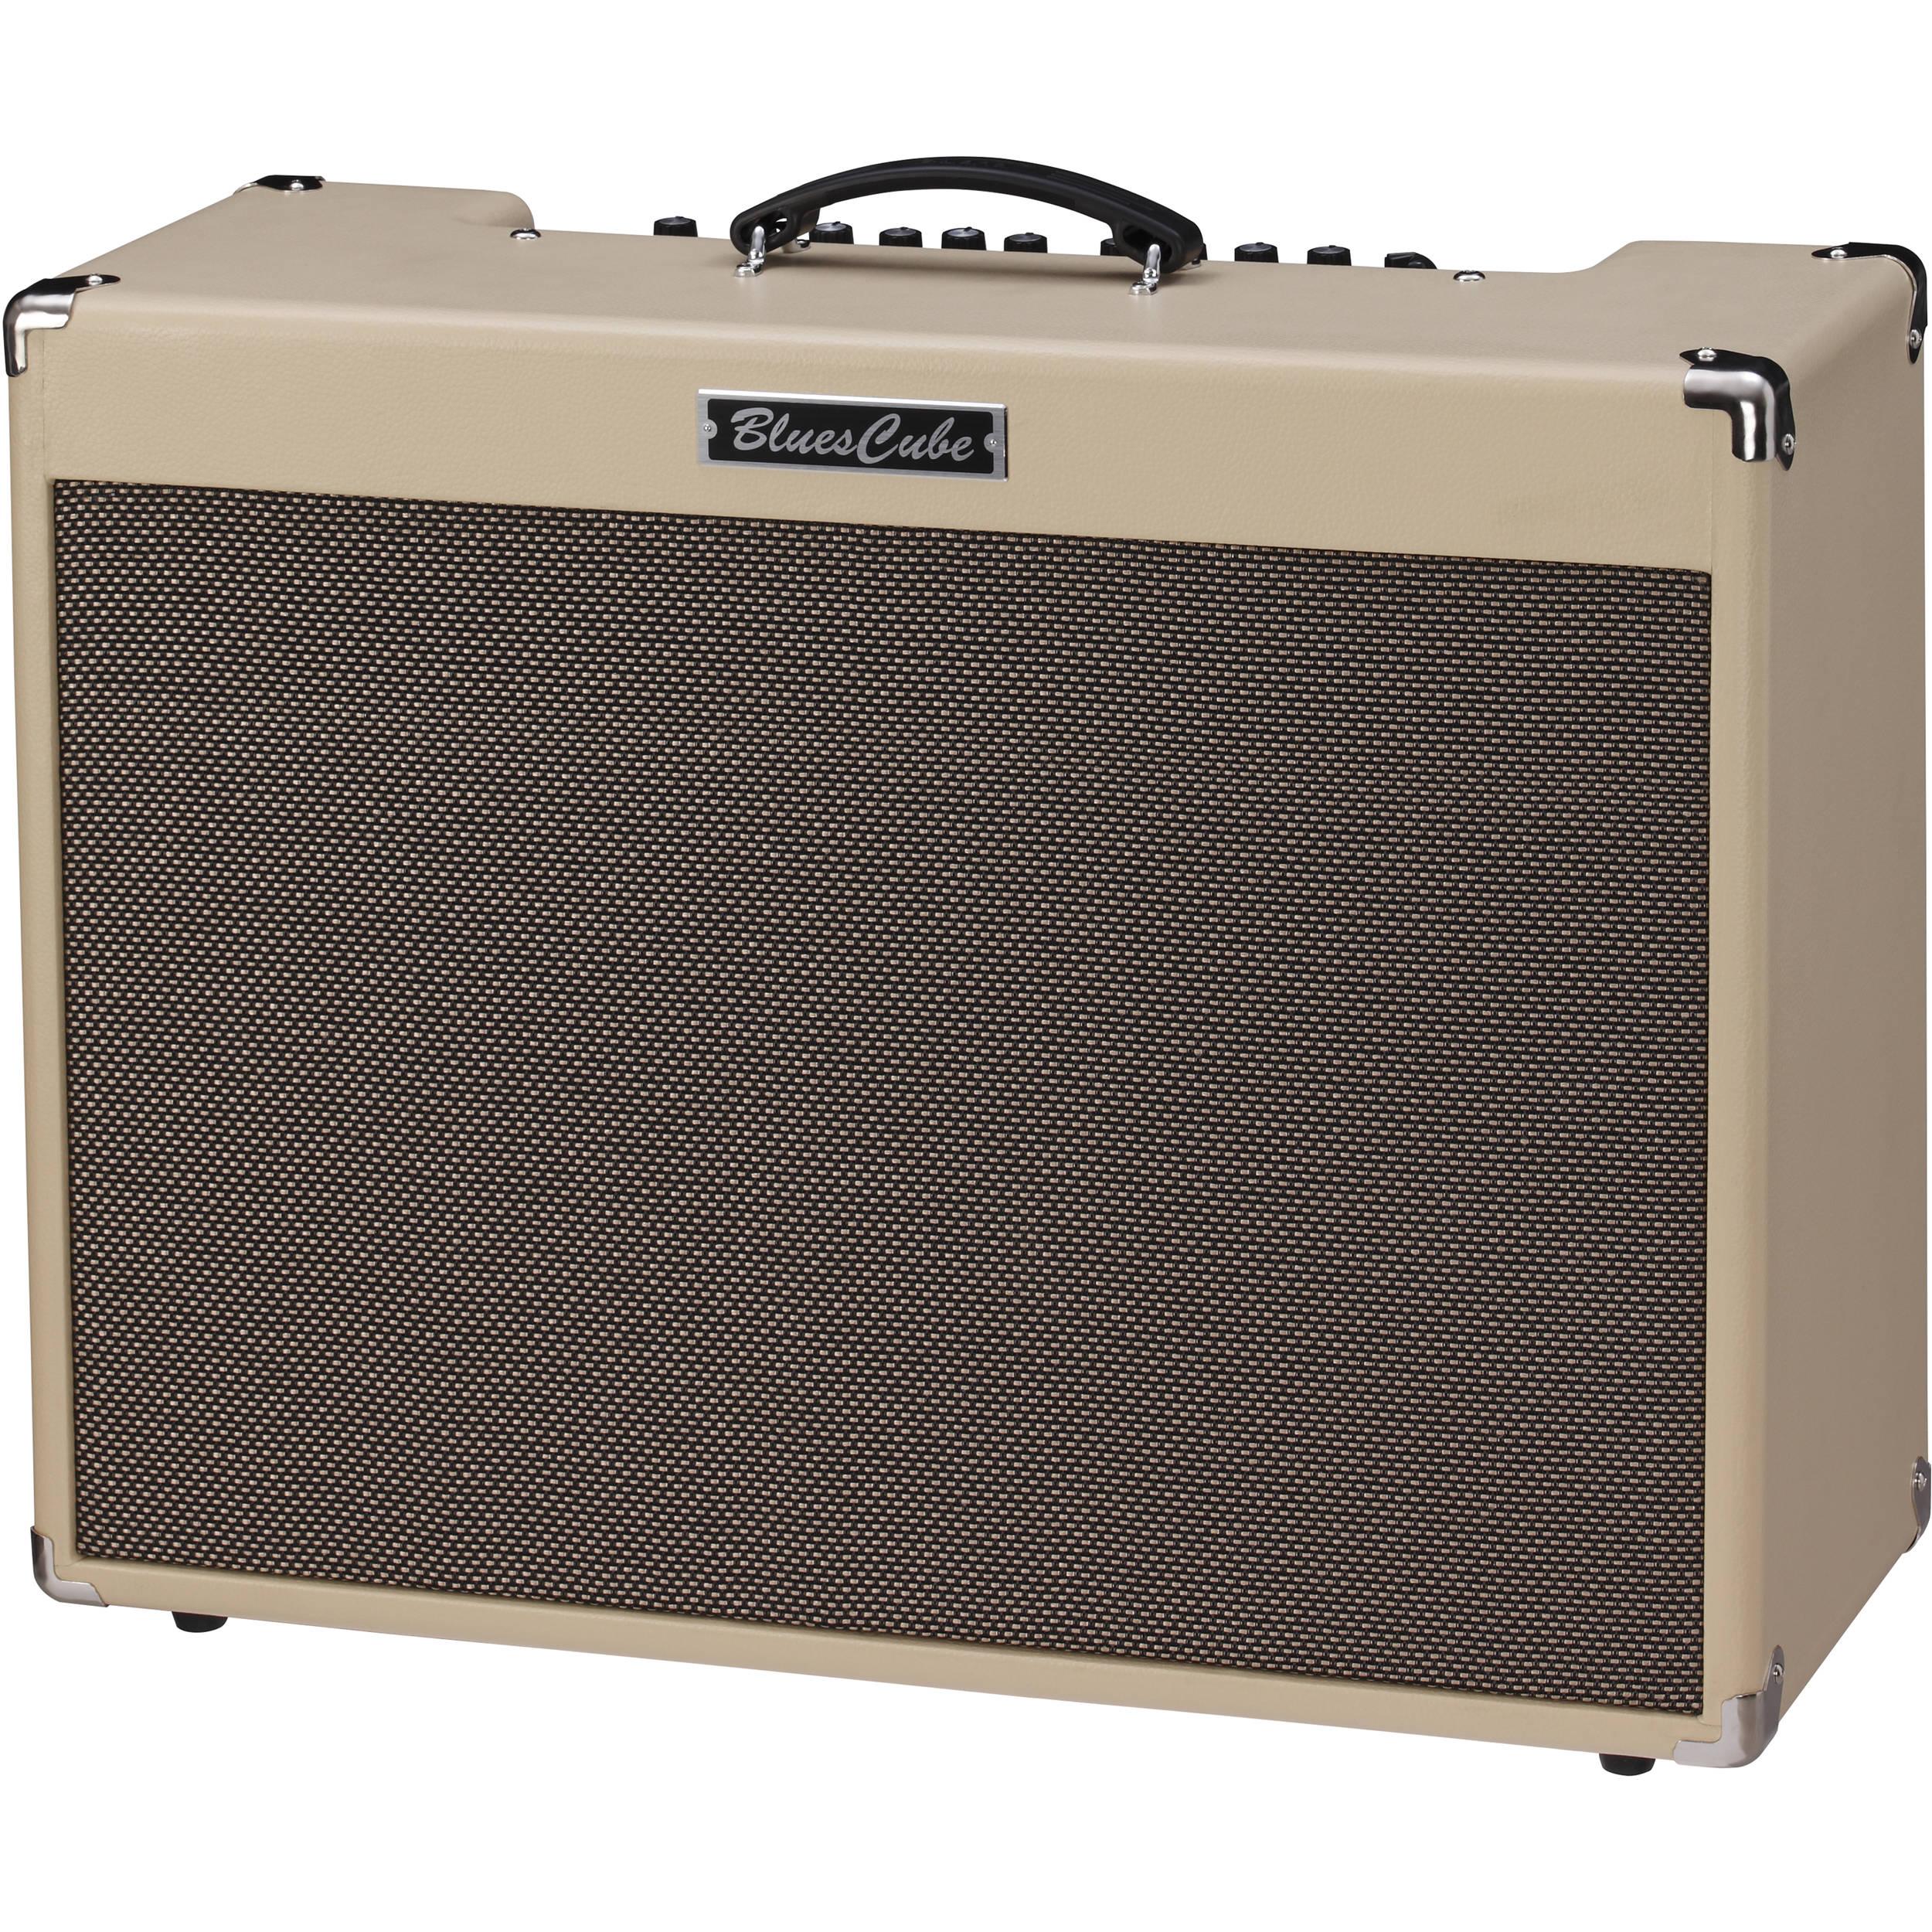 roland blues cube artist 85w 2x12 combo amplifier bc art212 b h. Black Bedroom Furniture Sets. Home Design Ideas